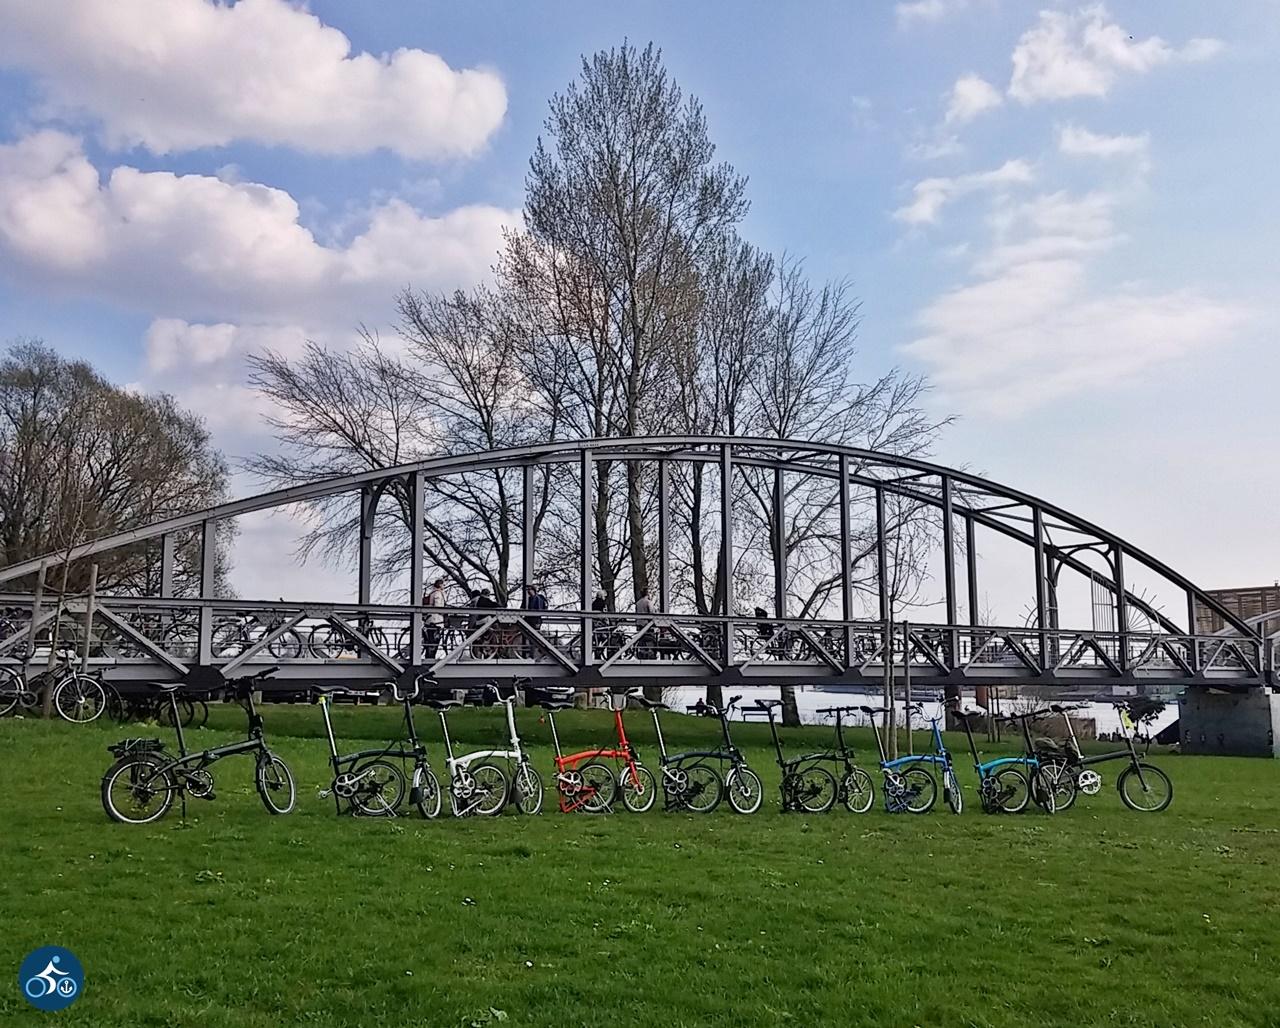 10 Falter vor der Brücke zum Café Entenwerder